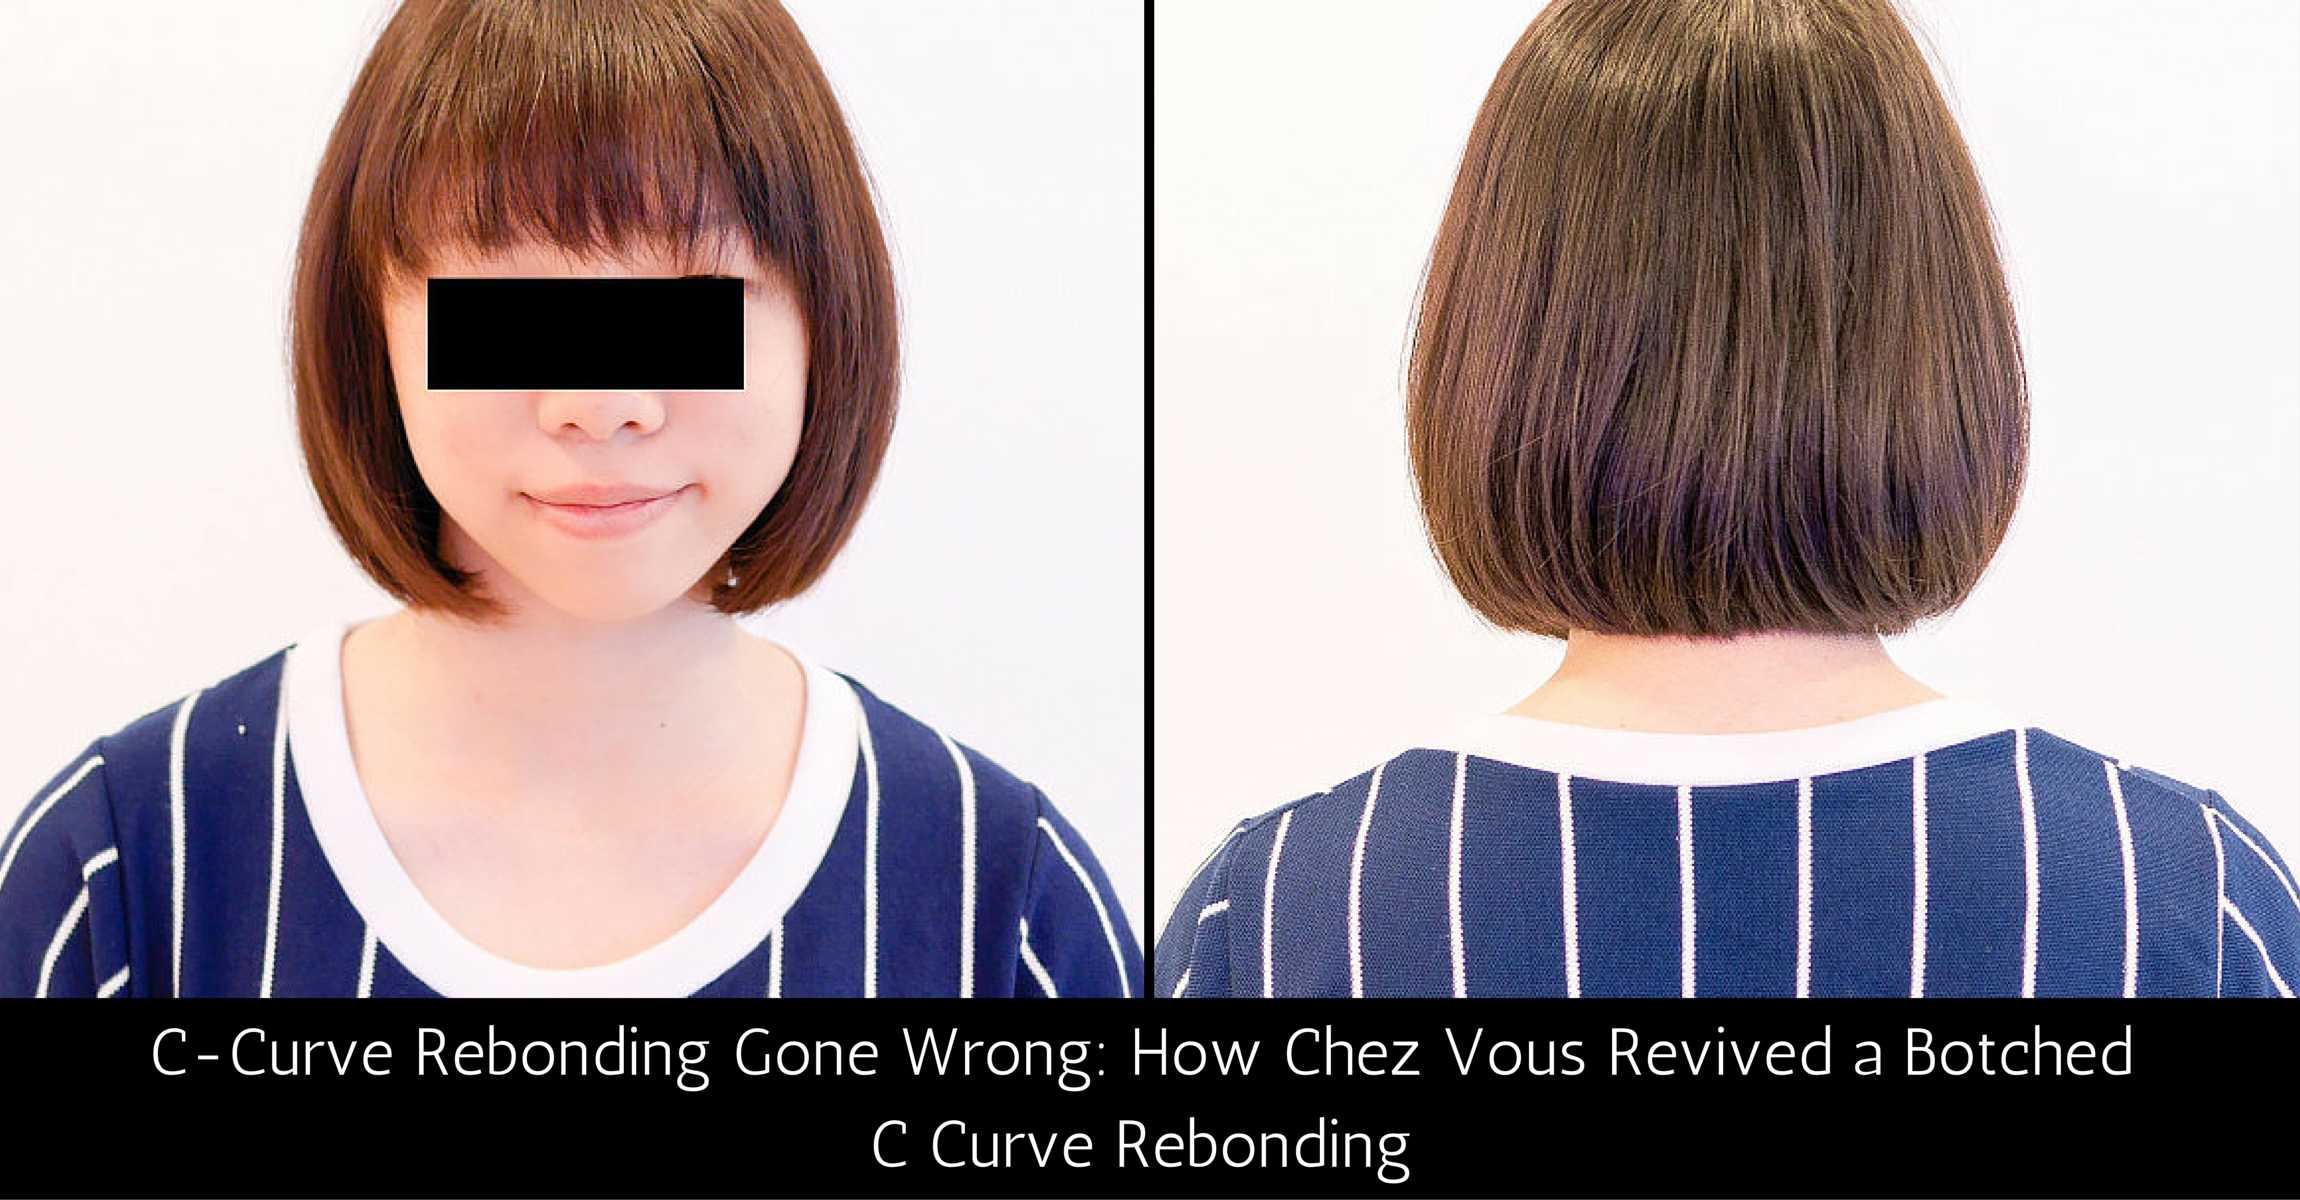 C Curve Rebonding Gone Wrong How Chez Vous Hair Salon Revived A